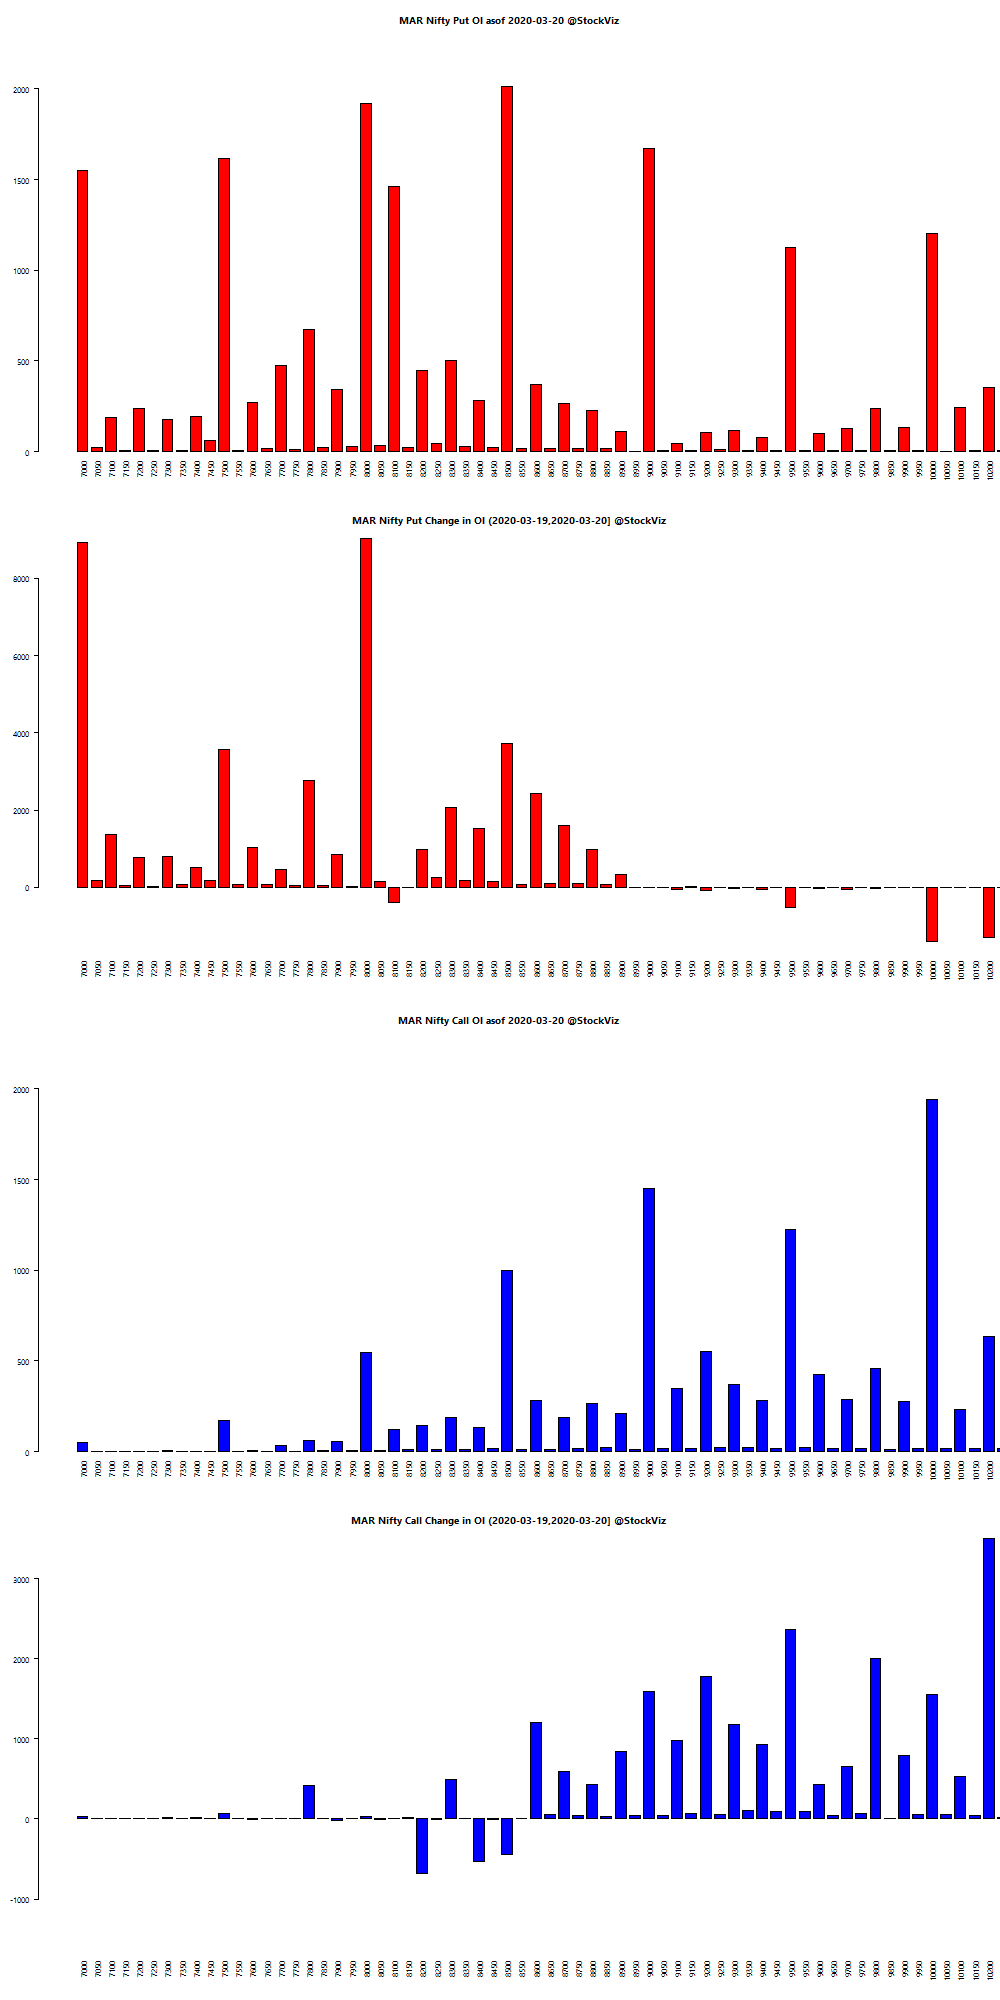 MAR NIFTY OI chart